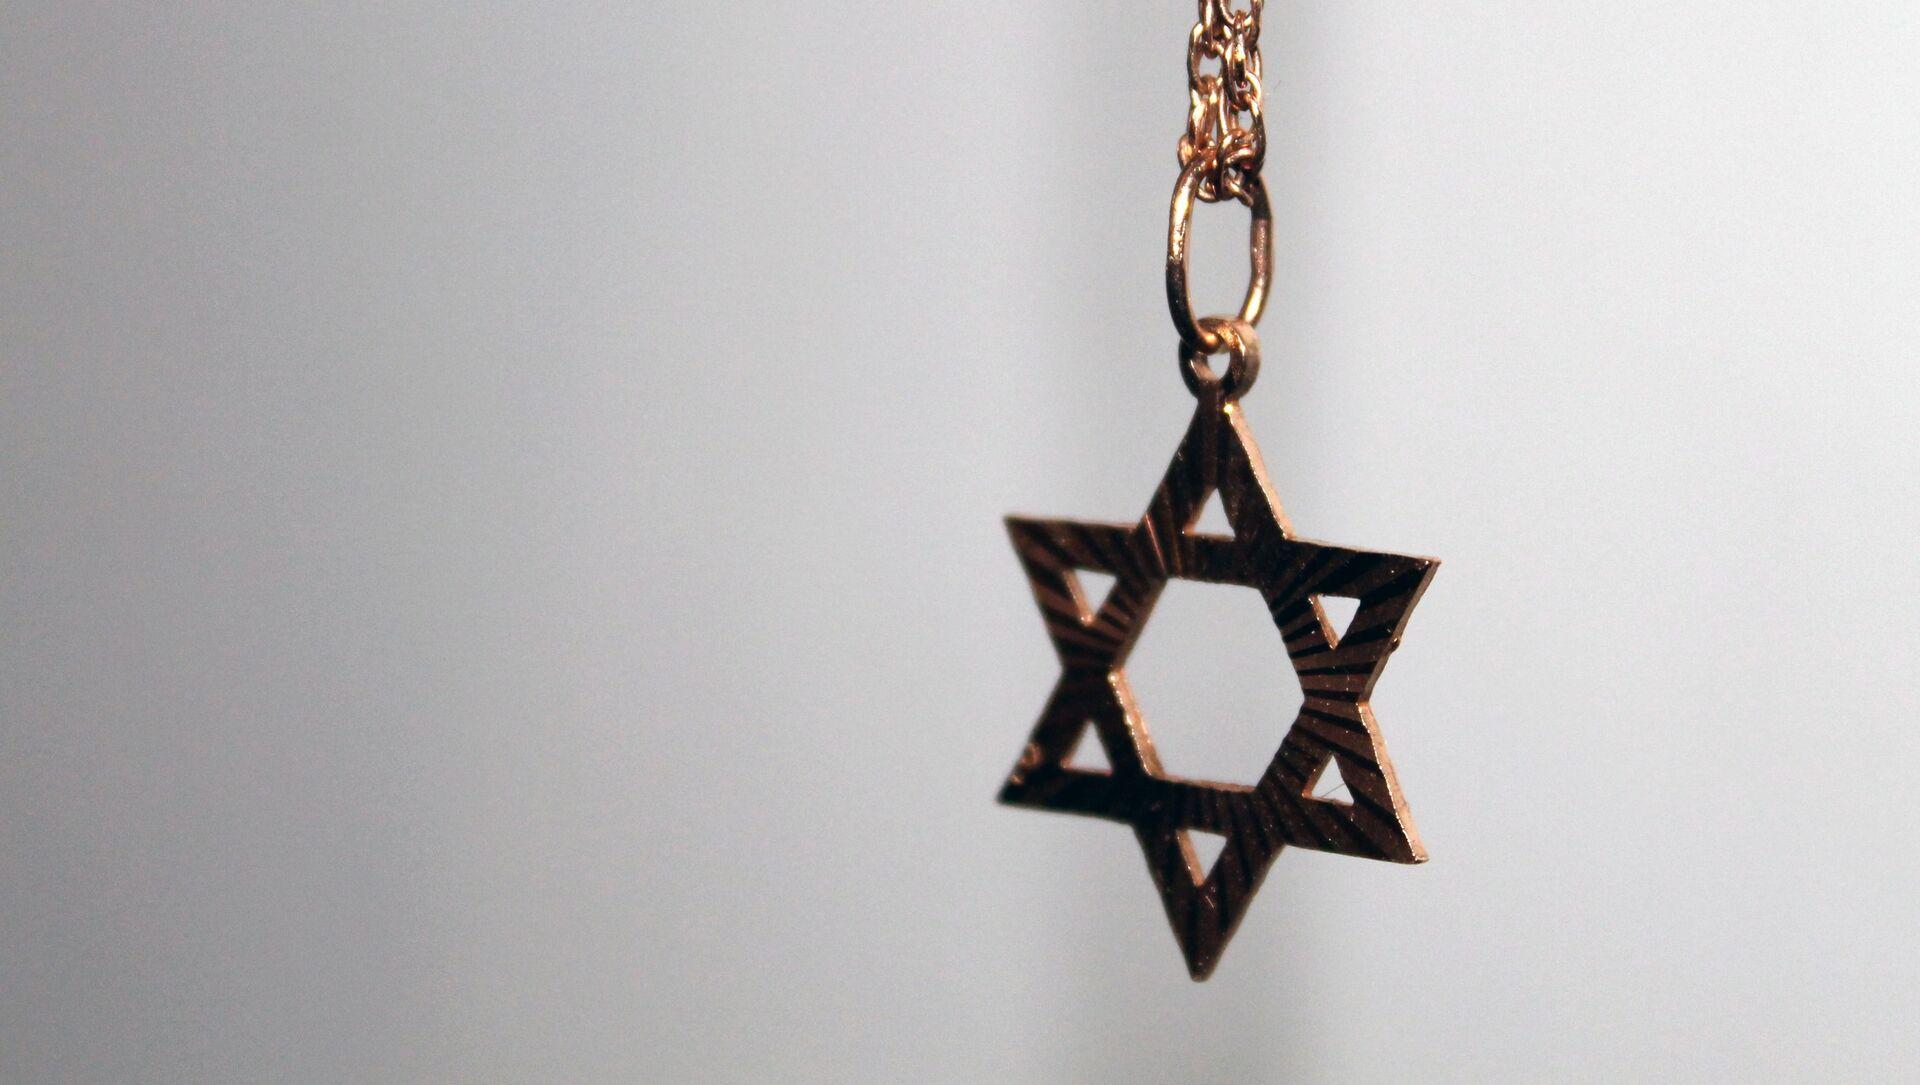 Star of David necklace - Sputnik International, 1920, 07.04.2021